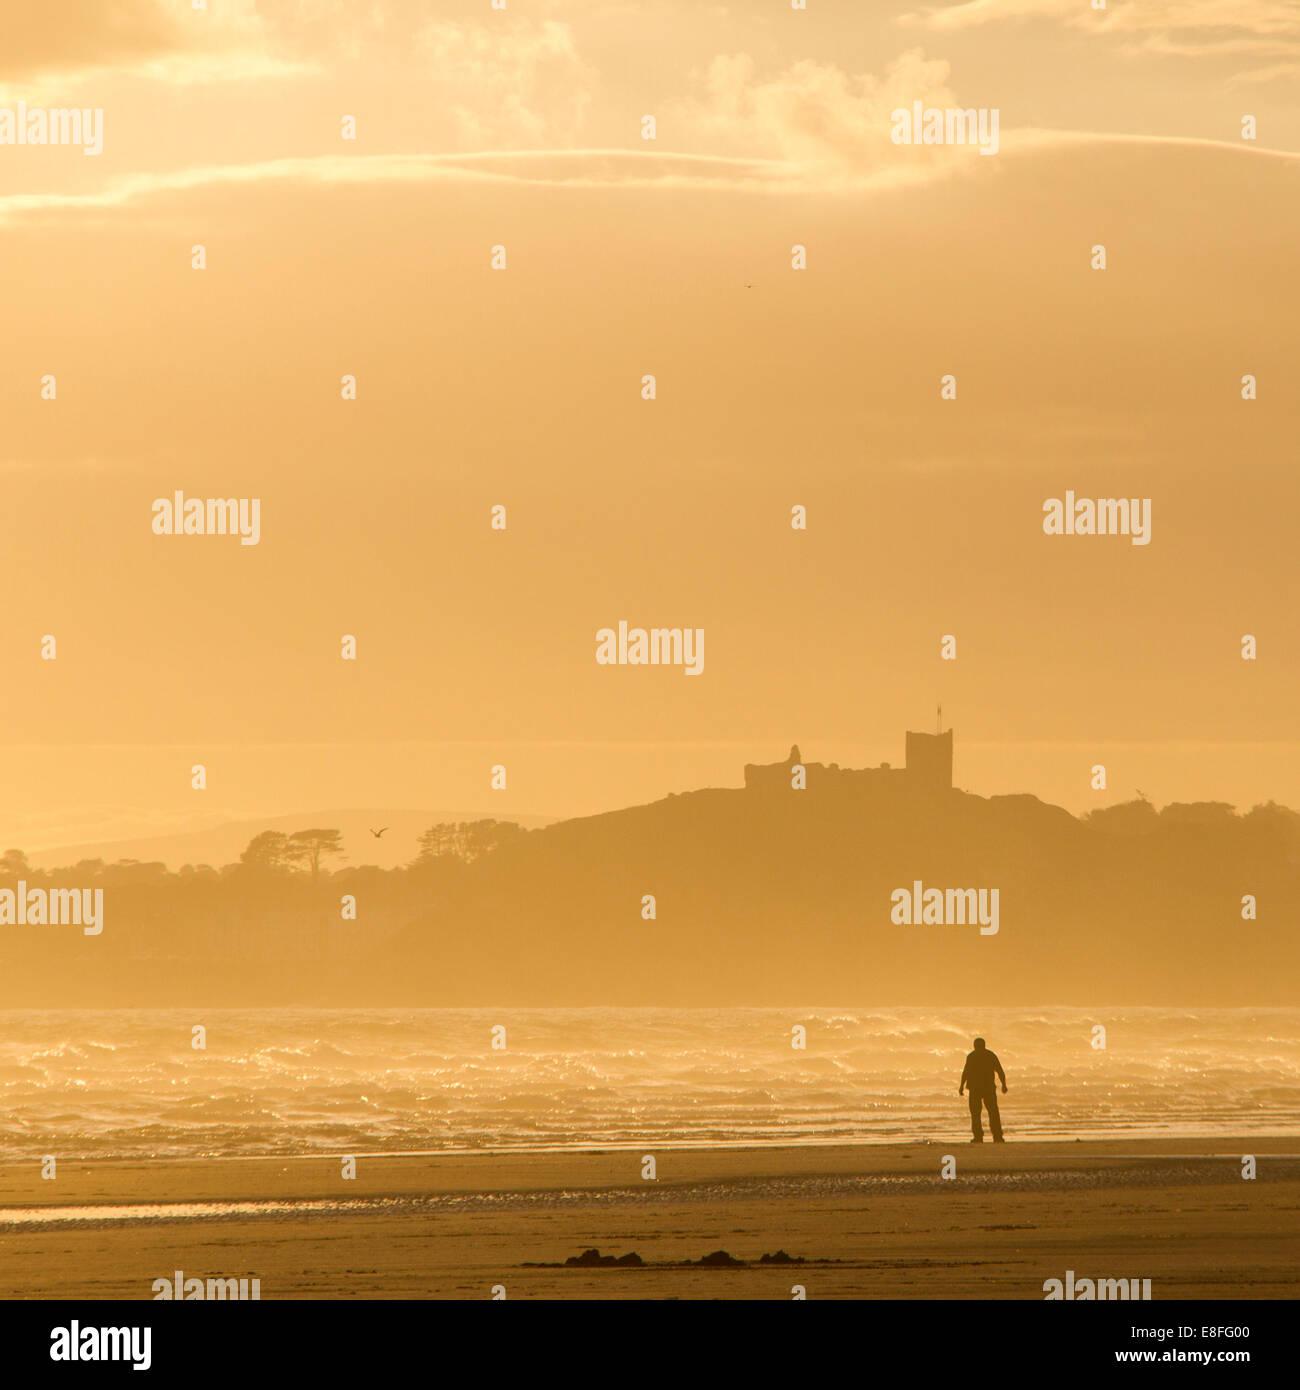 Man alone on beach - Stock Image